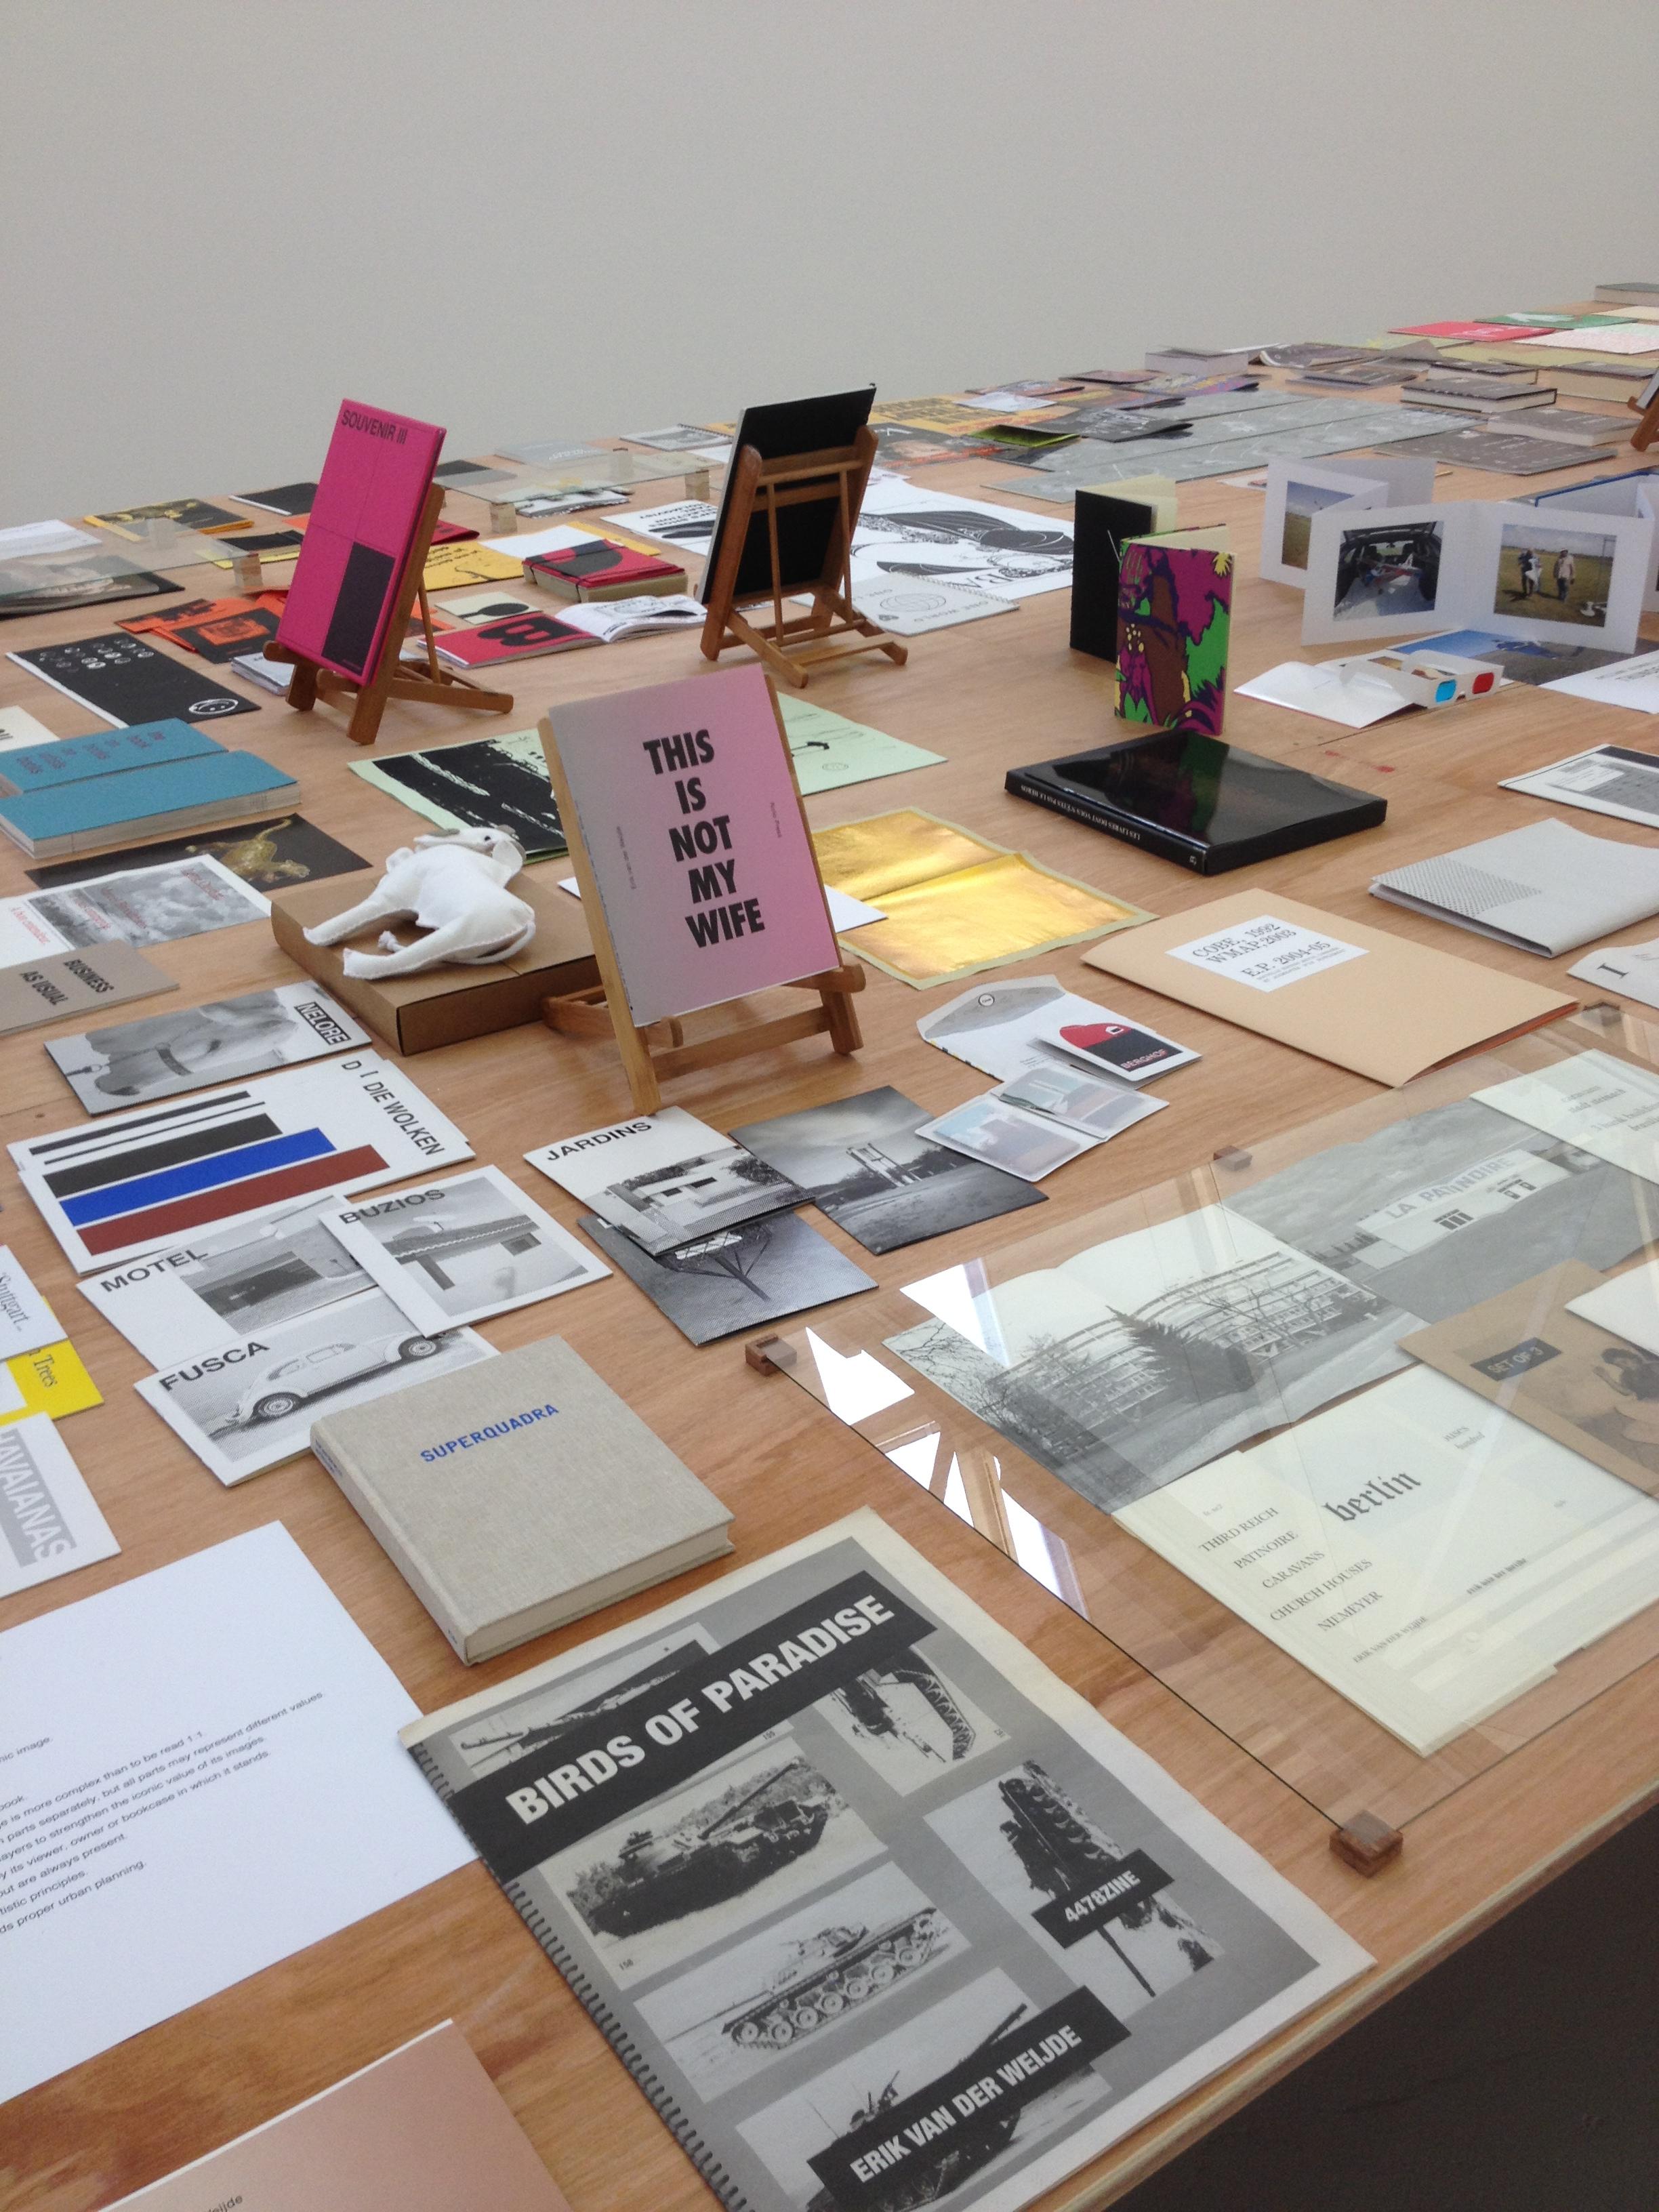 books - Greengrassi, Corvi-Mora - Kenningtonrunoff.com